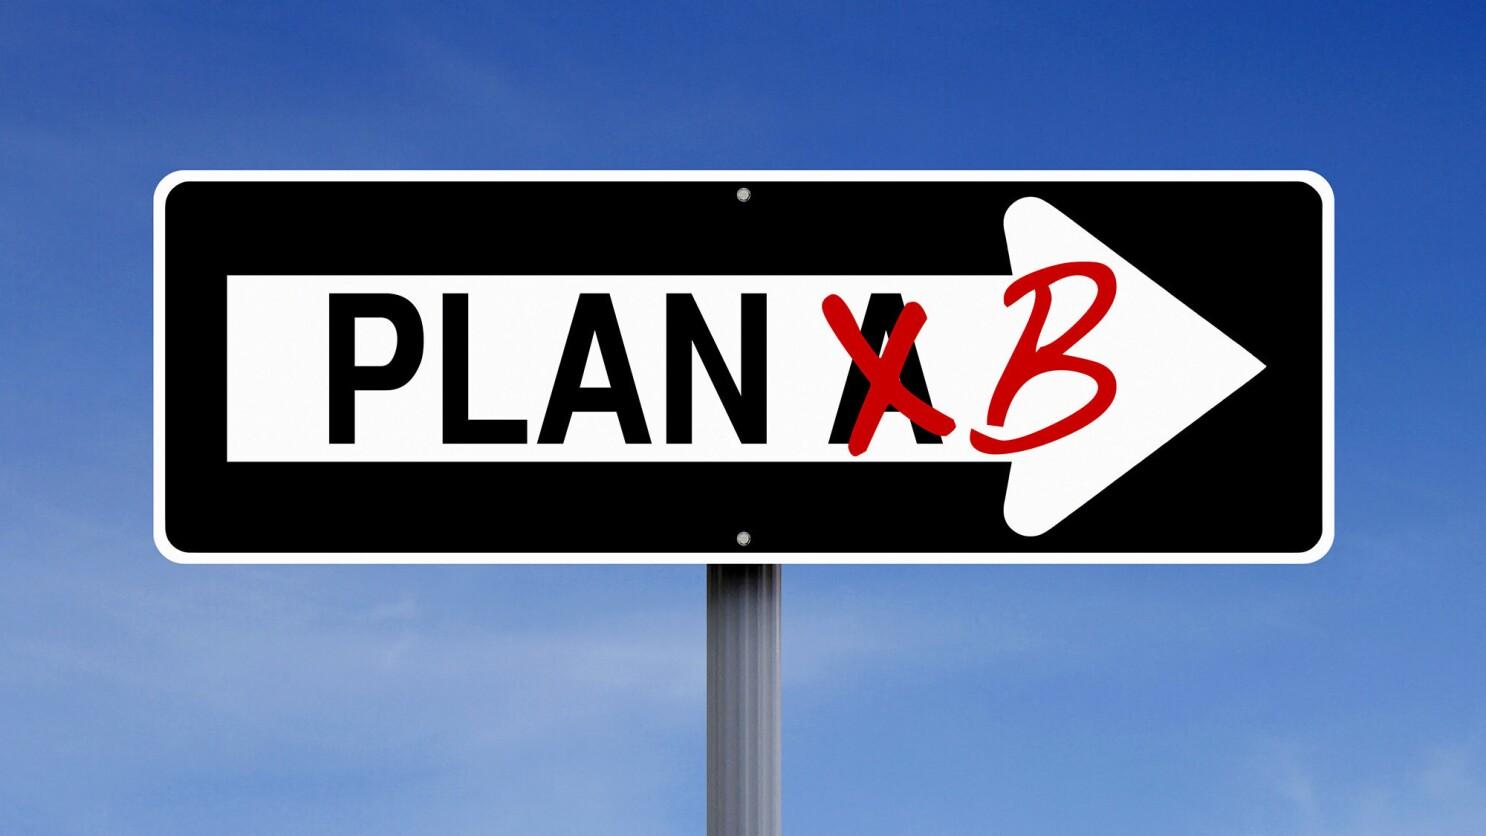 Rencana Cadangan - Rencana Matang Masa Depan